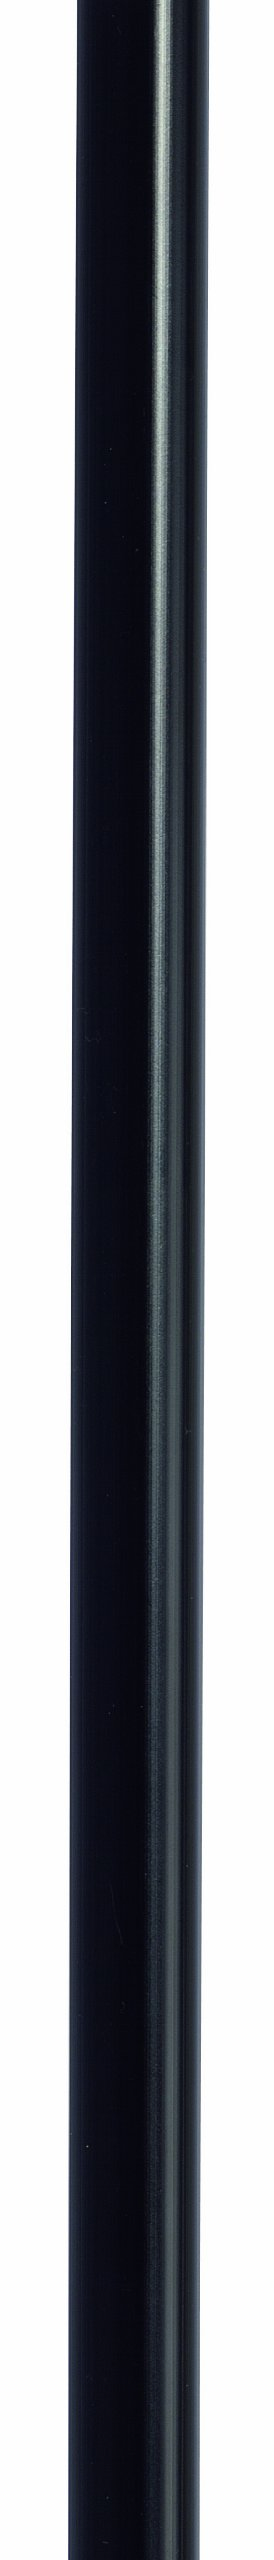 Durable Eurobar 3Mm A4 Spine Bar - Black (Pack Of 50)